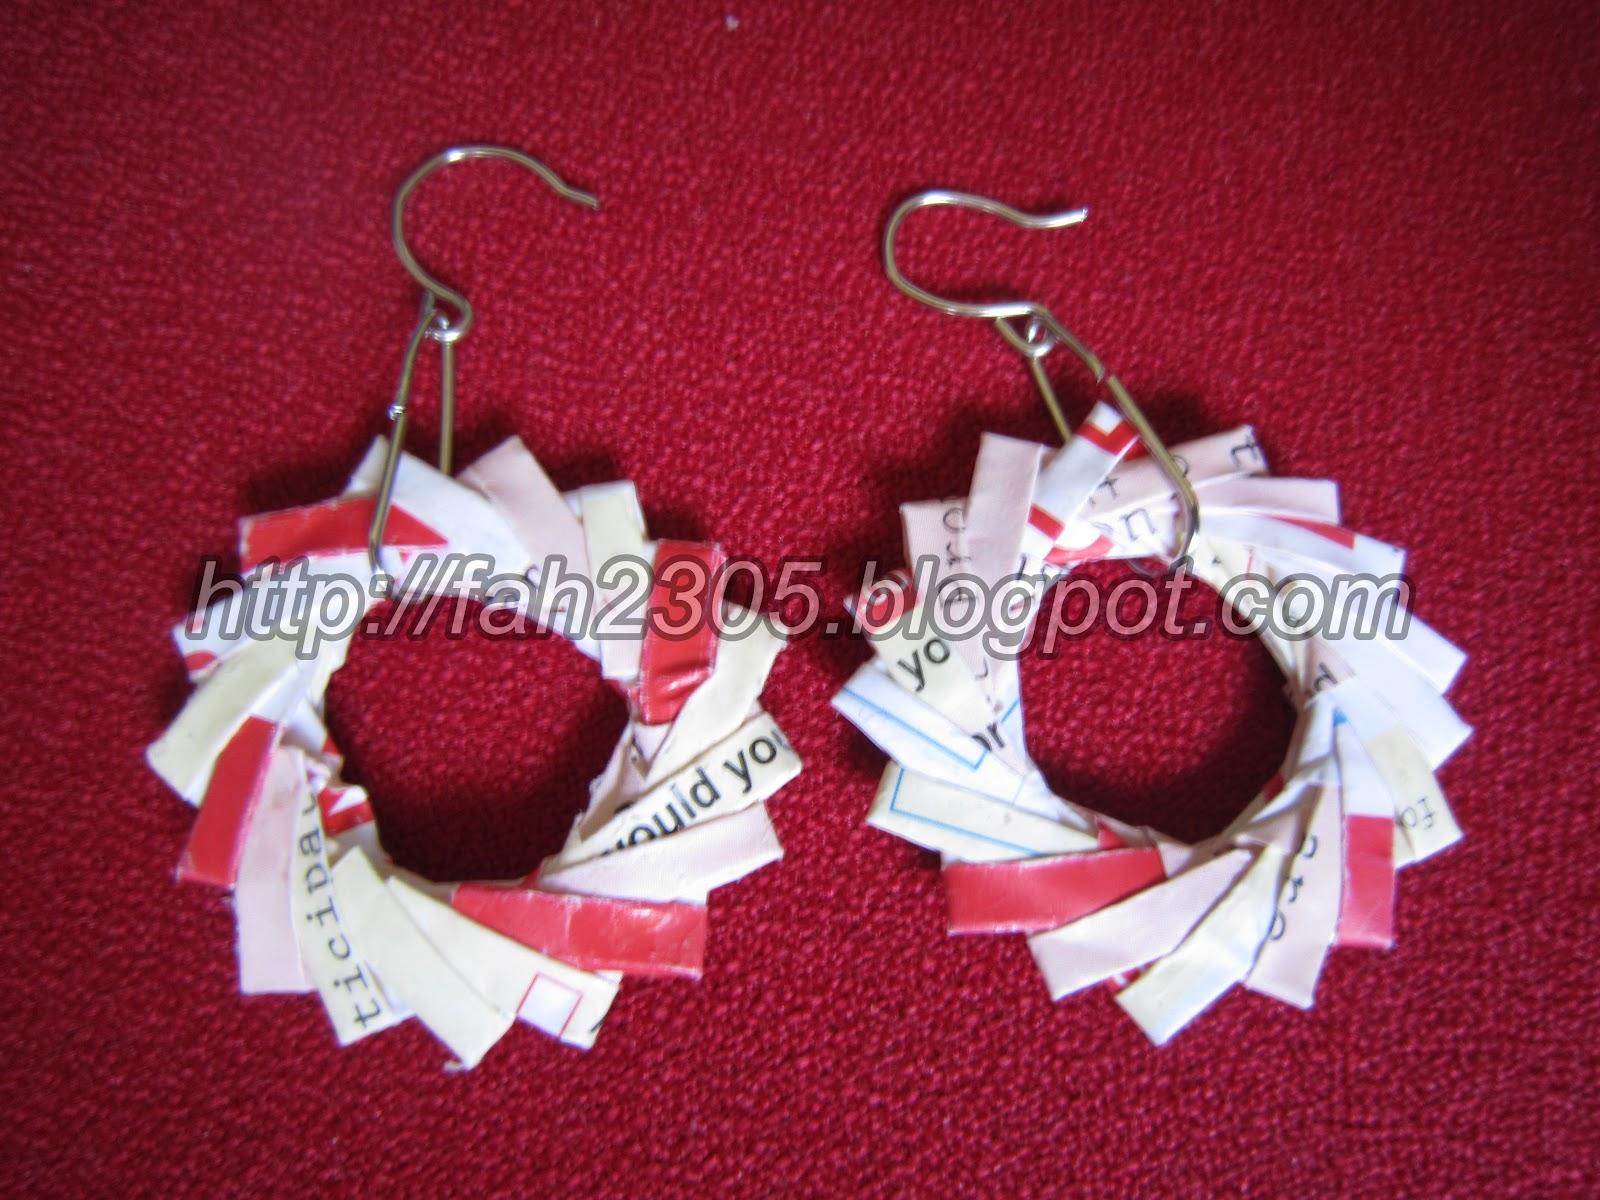 http://4.bp.blogspot.com/-kvlUh0UQjMg/TzpWYR1bKJI/AAAAAAAAAPo/X7X7DI5VhAE/s1600/Handmade+Origami+Paper+Wreath+Earrings.jpg